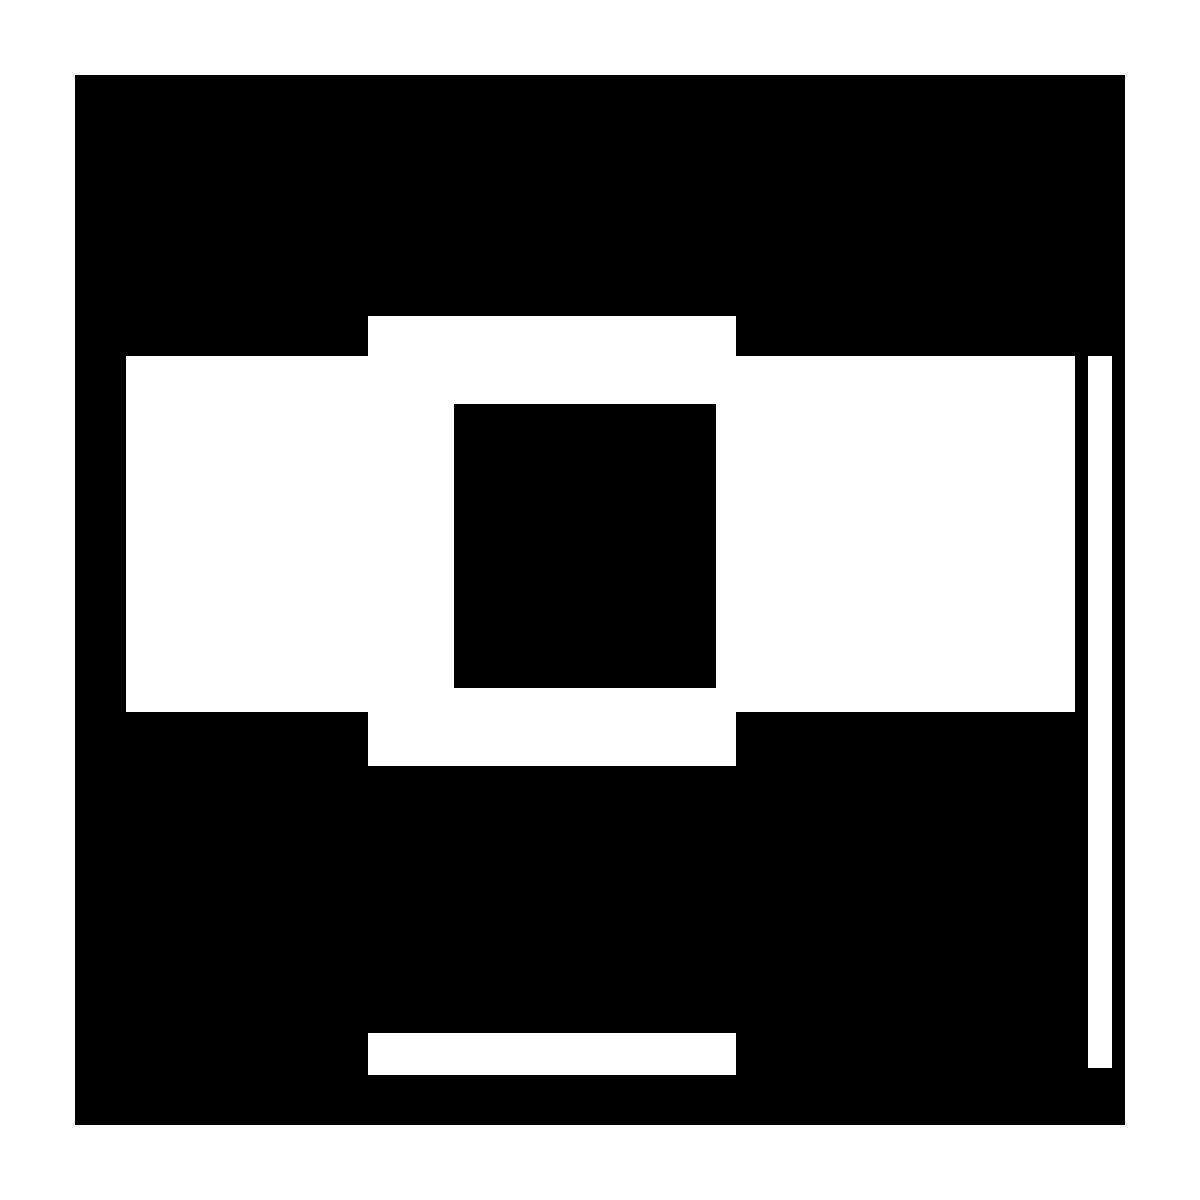 Thallium Detection